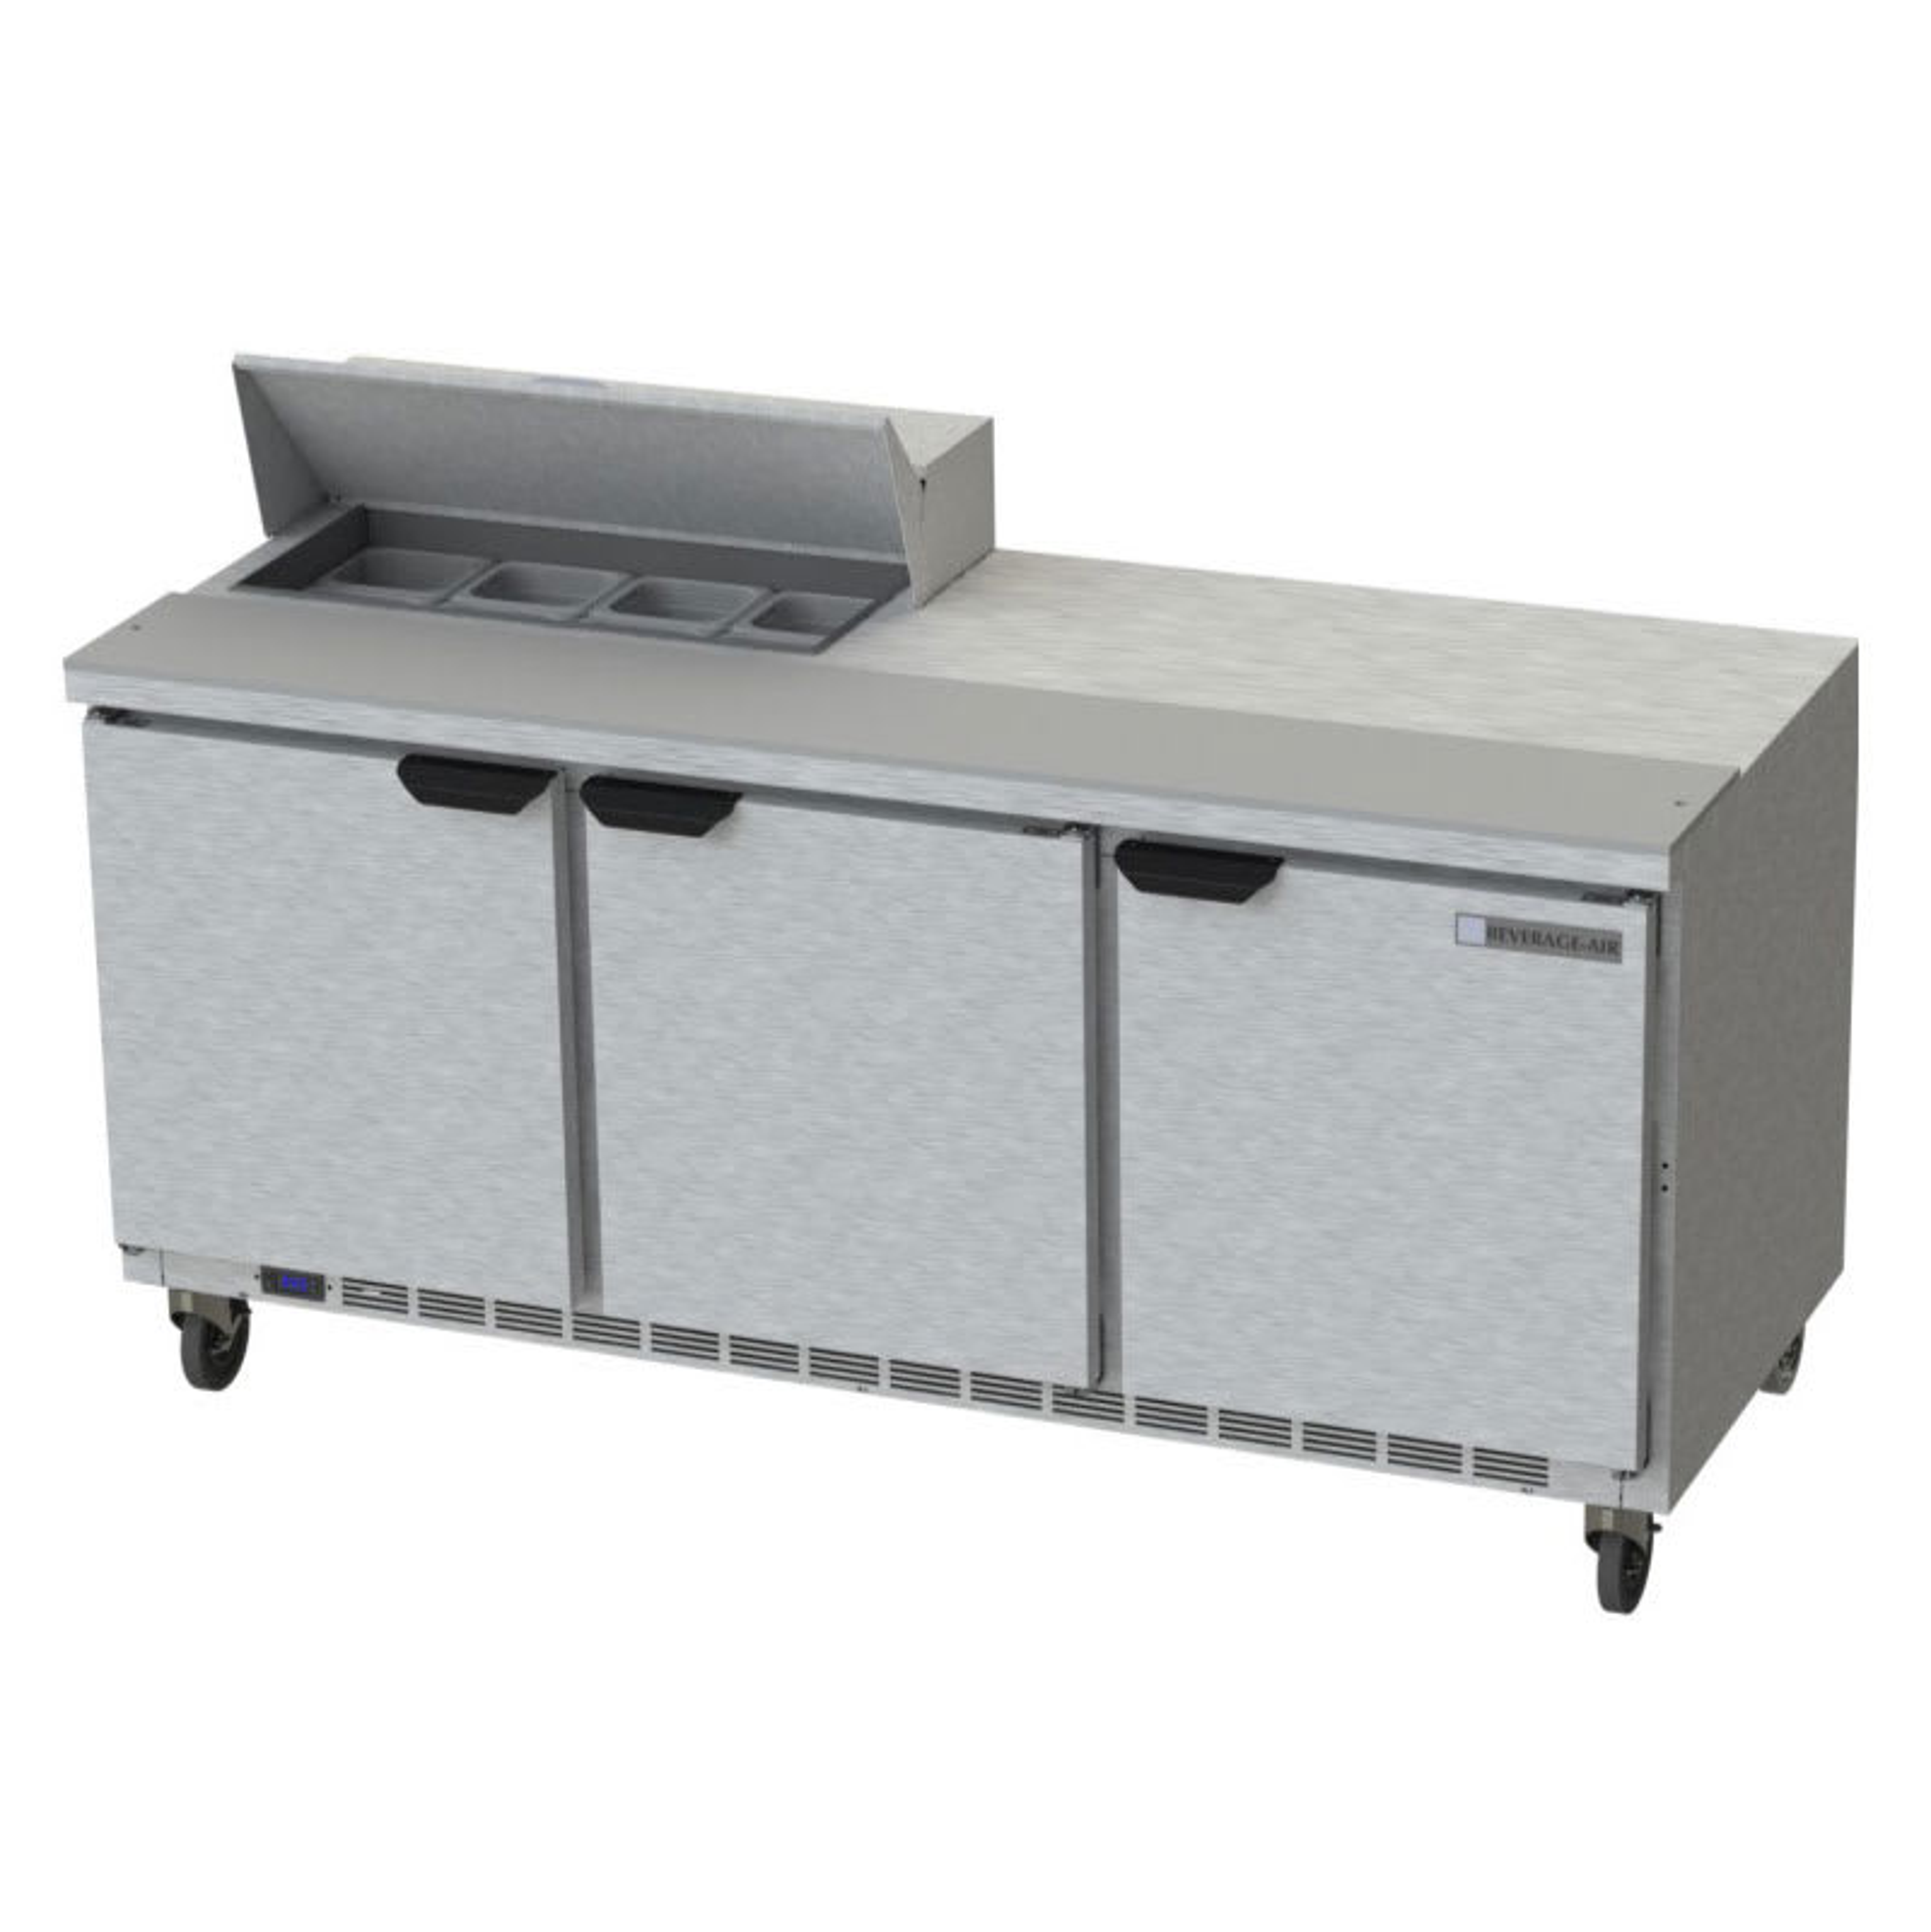 "Beverage Air SPE72HC-08 72"" Sandwich/Salad Prep Table w/ Refrigerated Base, 115v"